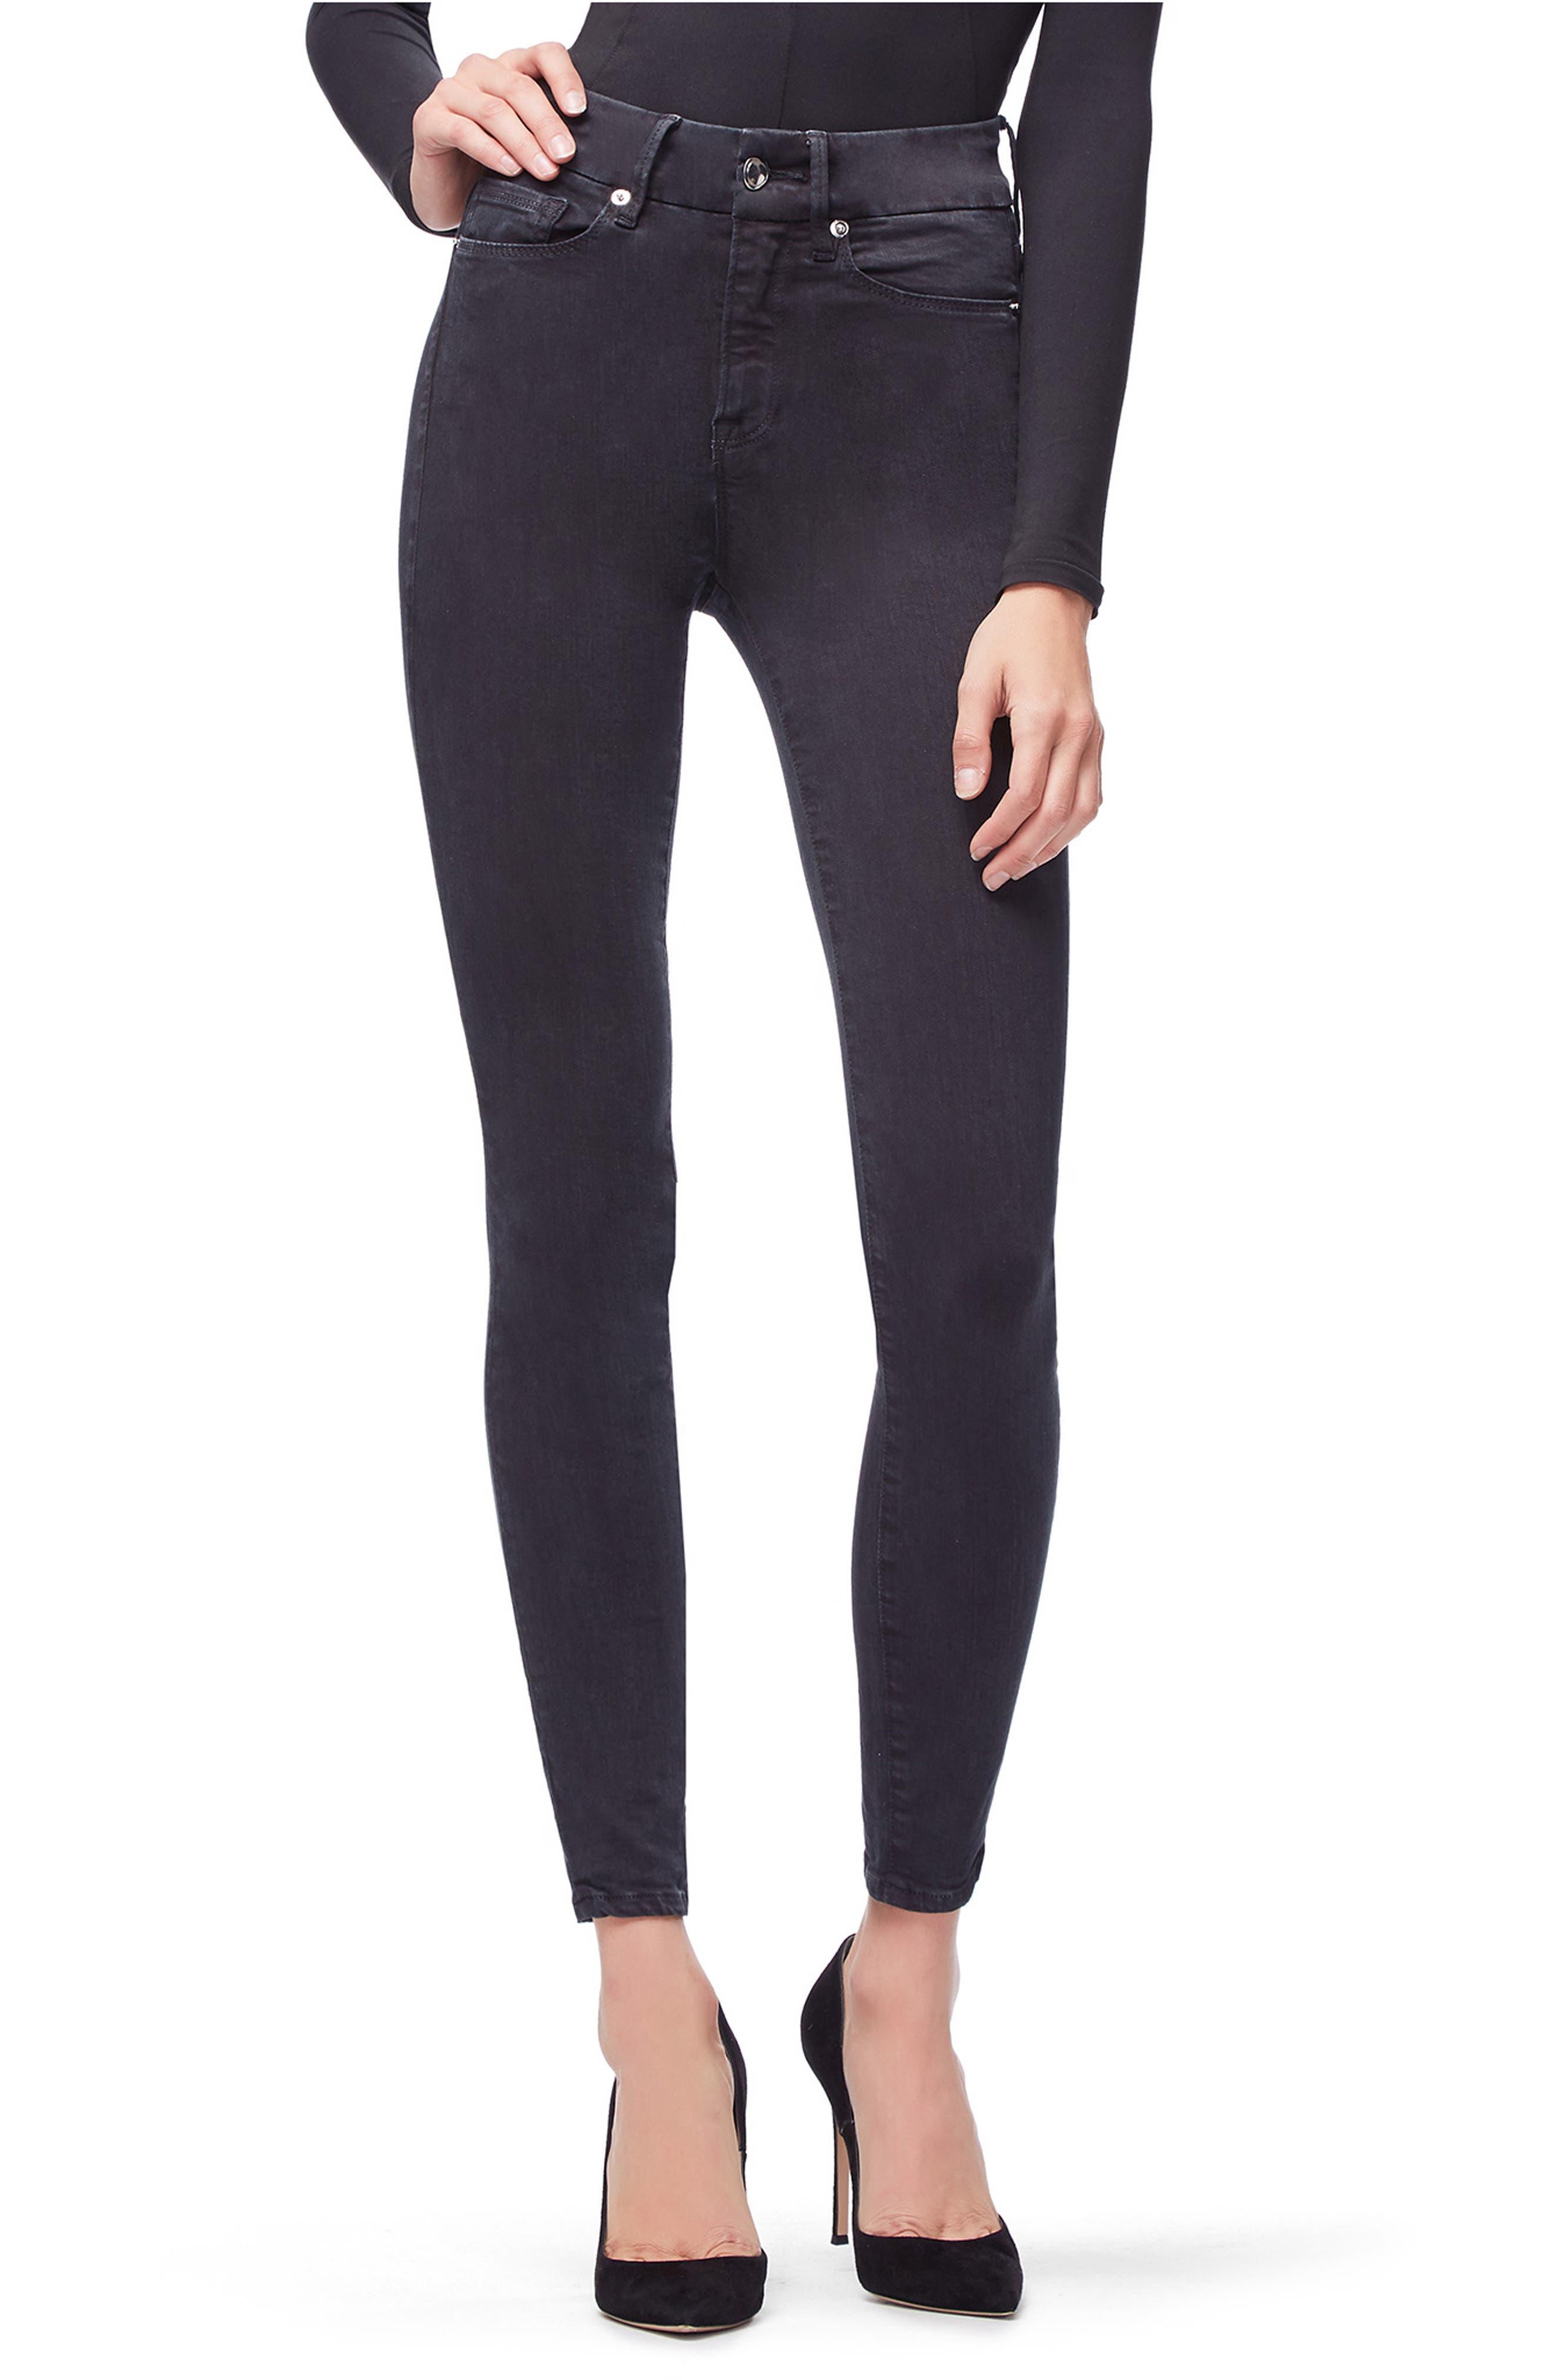 Good Legs High Waist Skinny Jeans,                             Main thumbnail 1, color,                             001